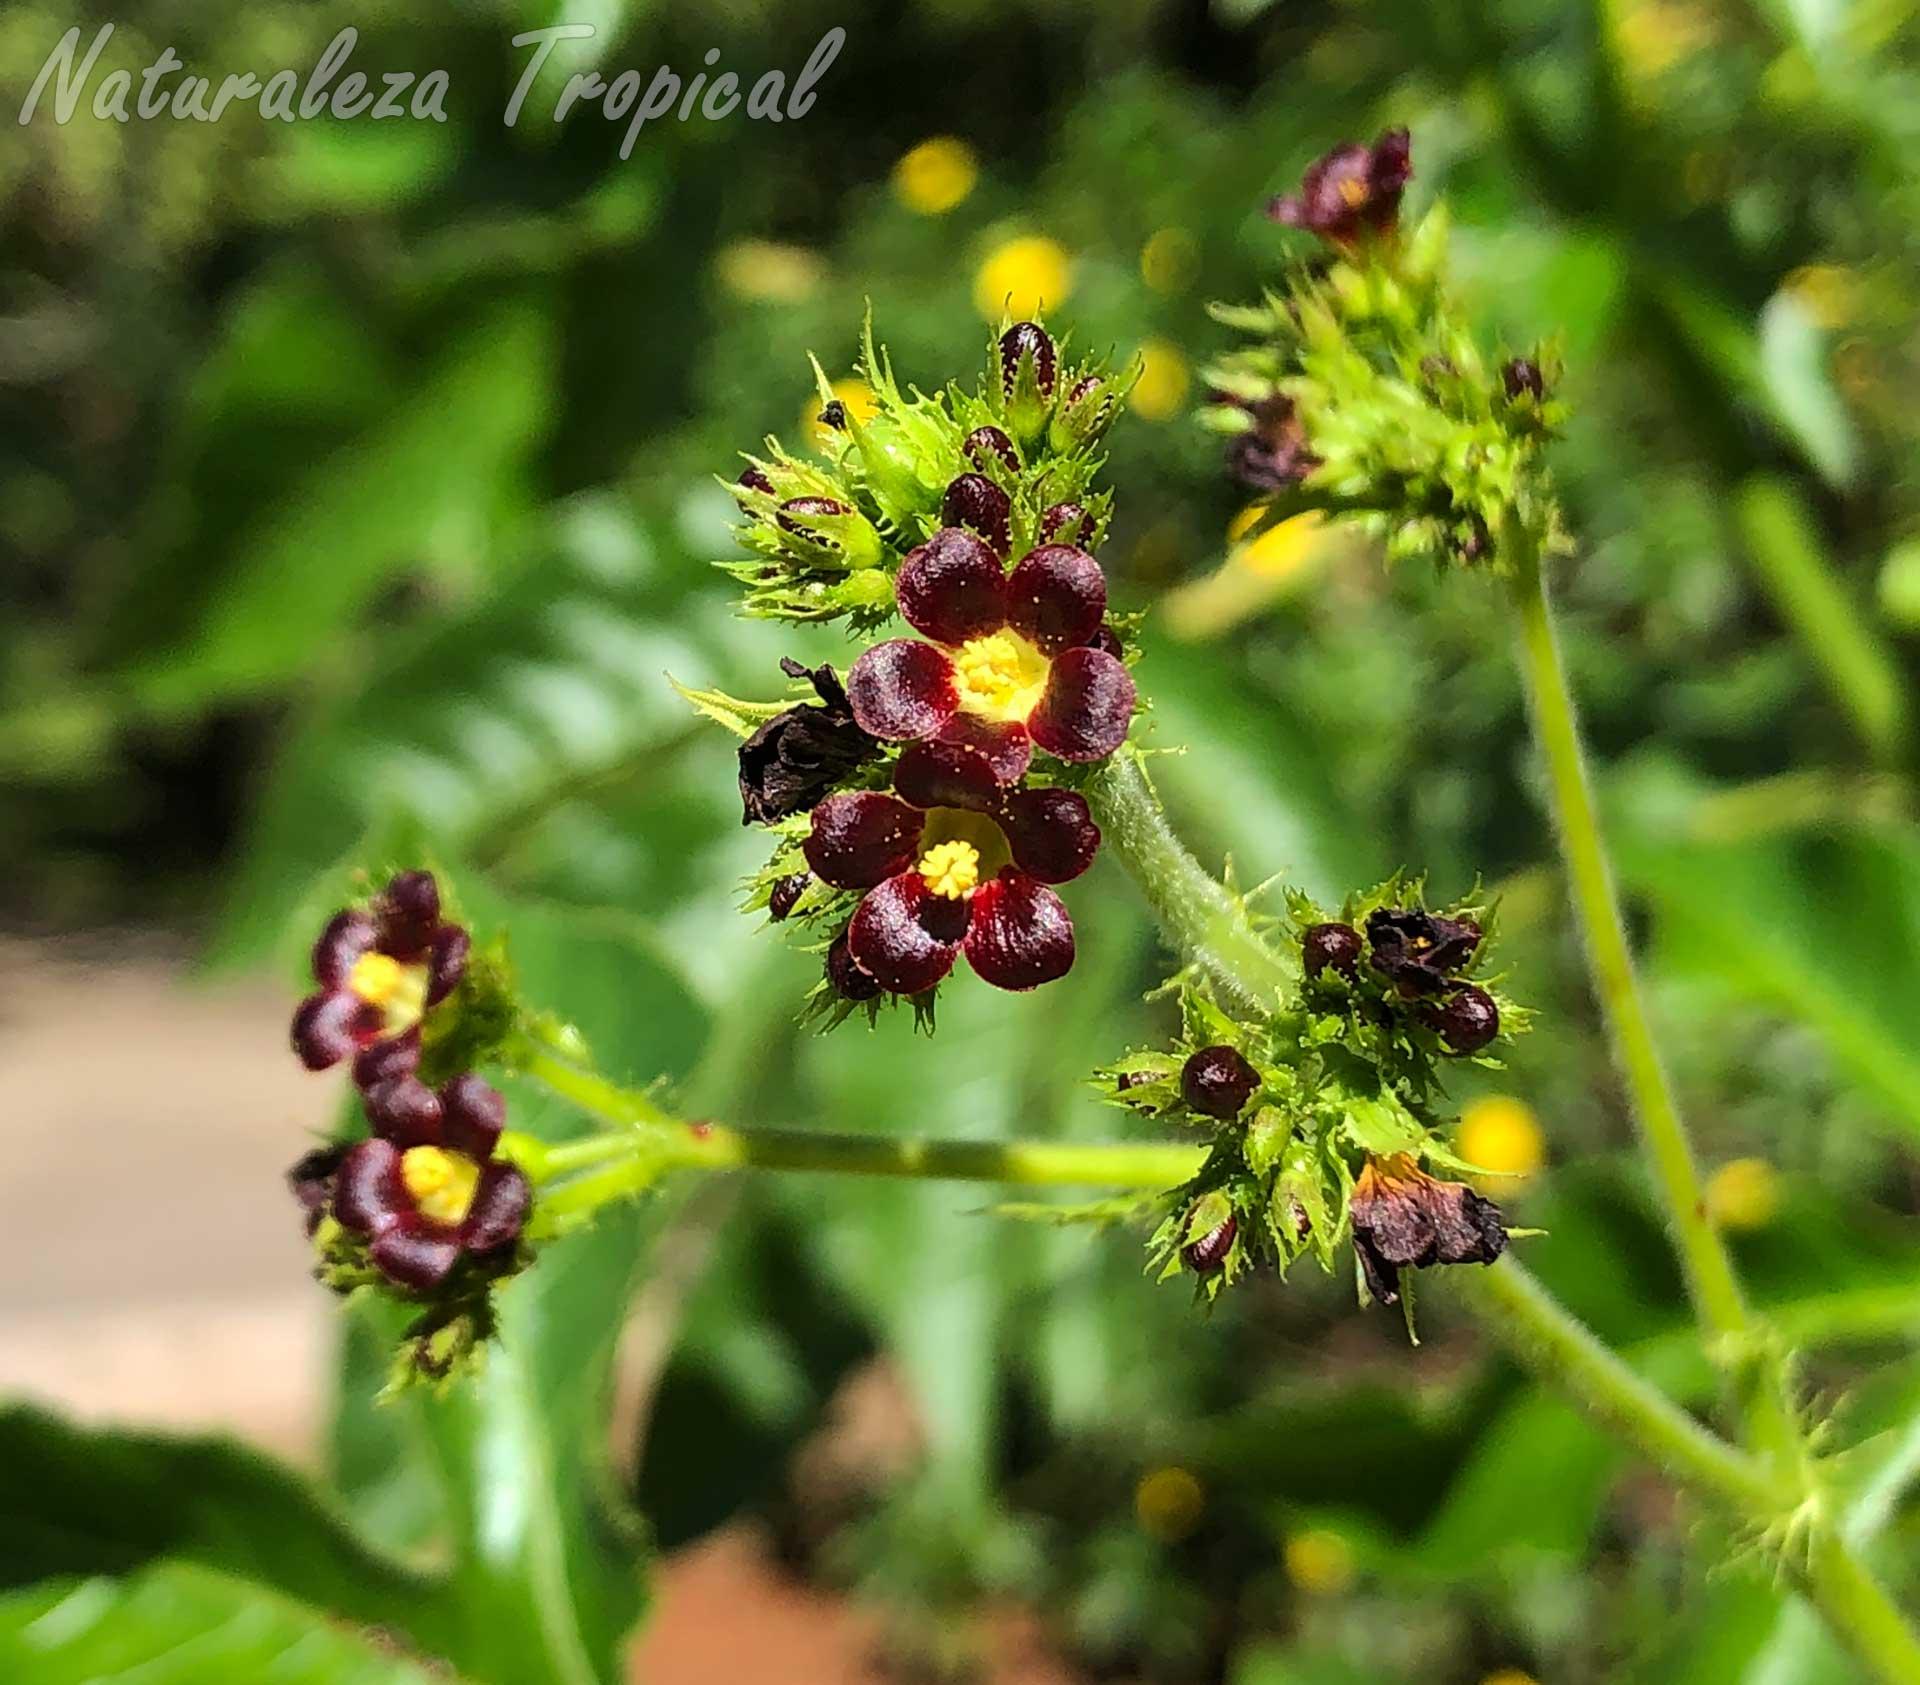 Flores características de la planta Tuatua, Jatropha gossypiifolia